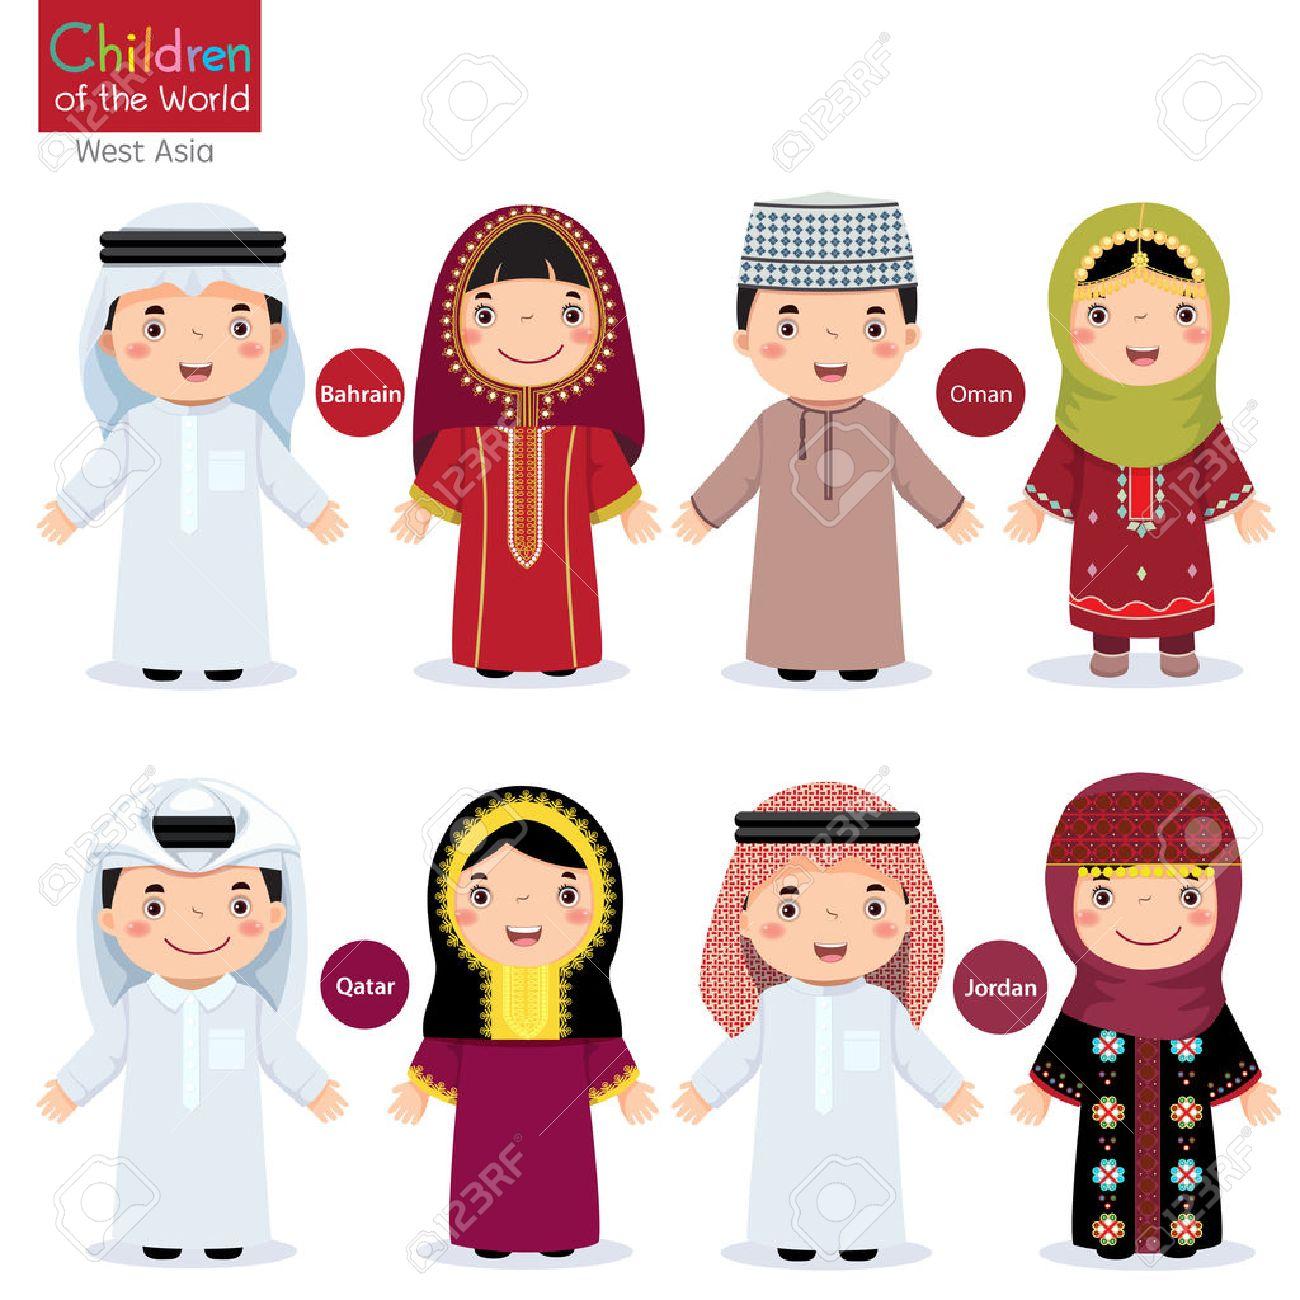 Kids in different traditional costumes (Bahrain, Oman, Qatar, Jordan) - 54931389